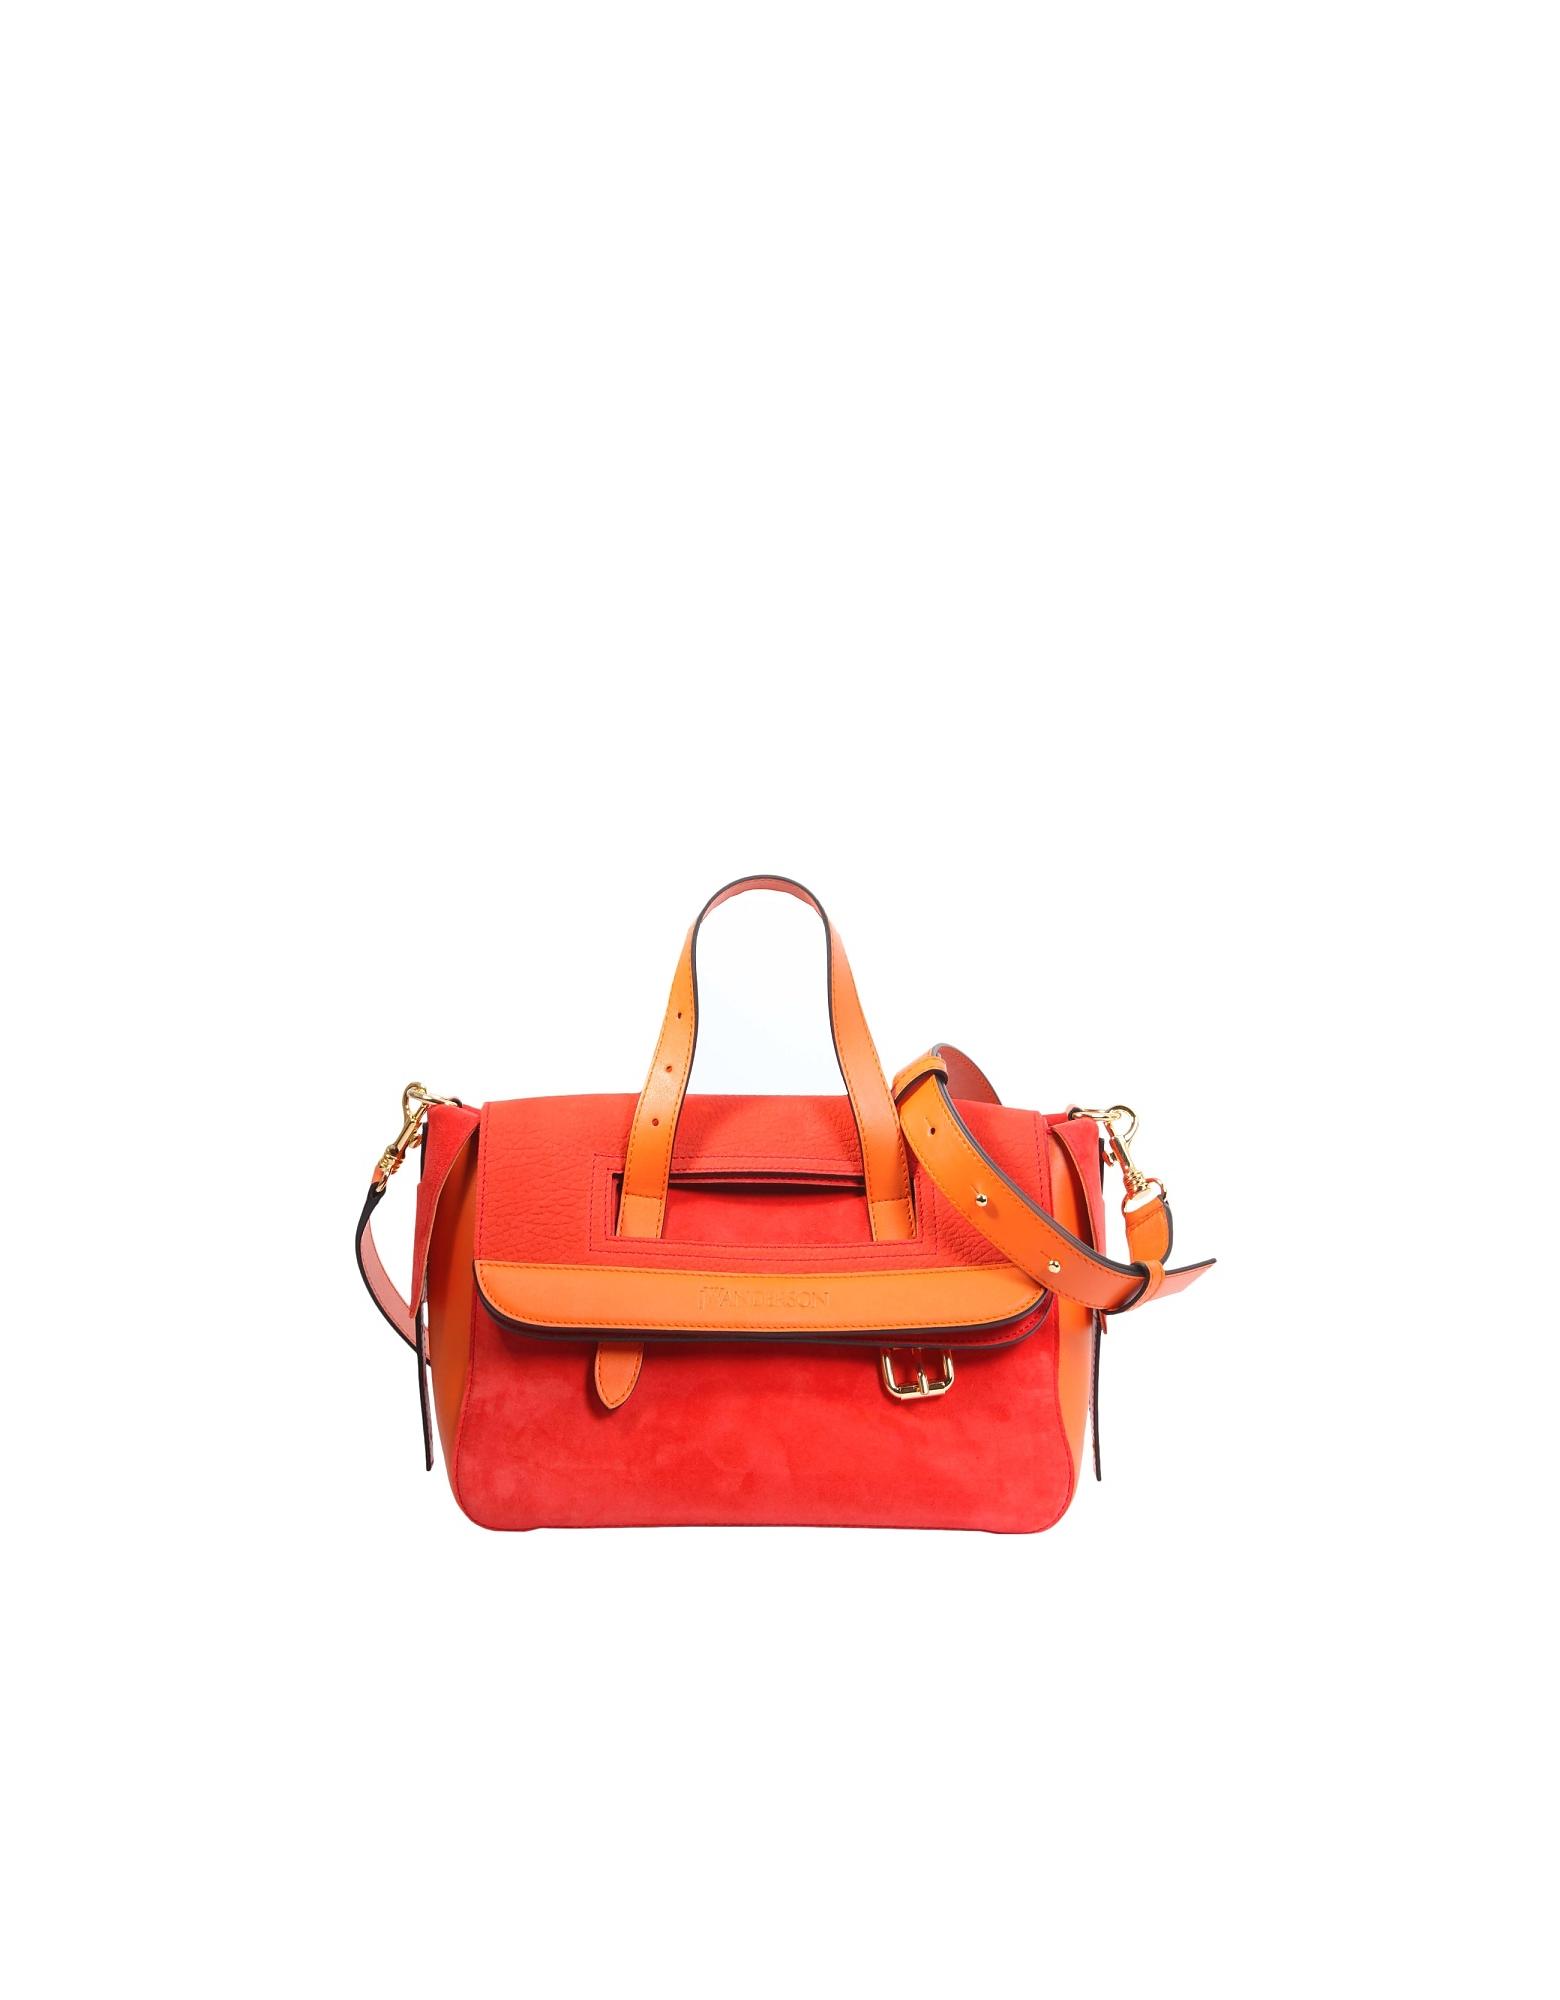 JW Anderson Designer Handbags, Tool Mini Bag